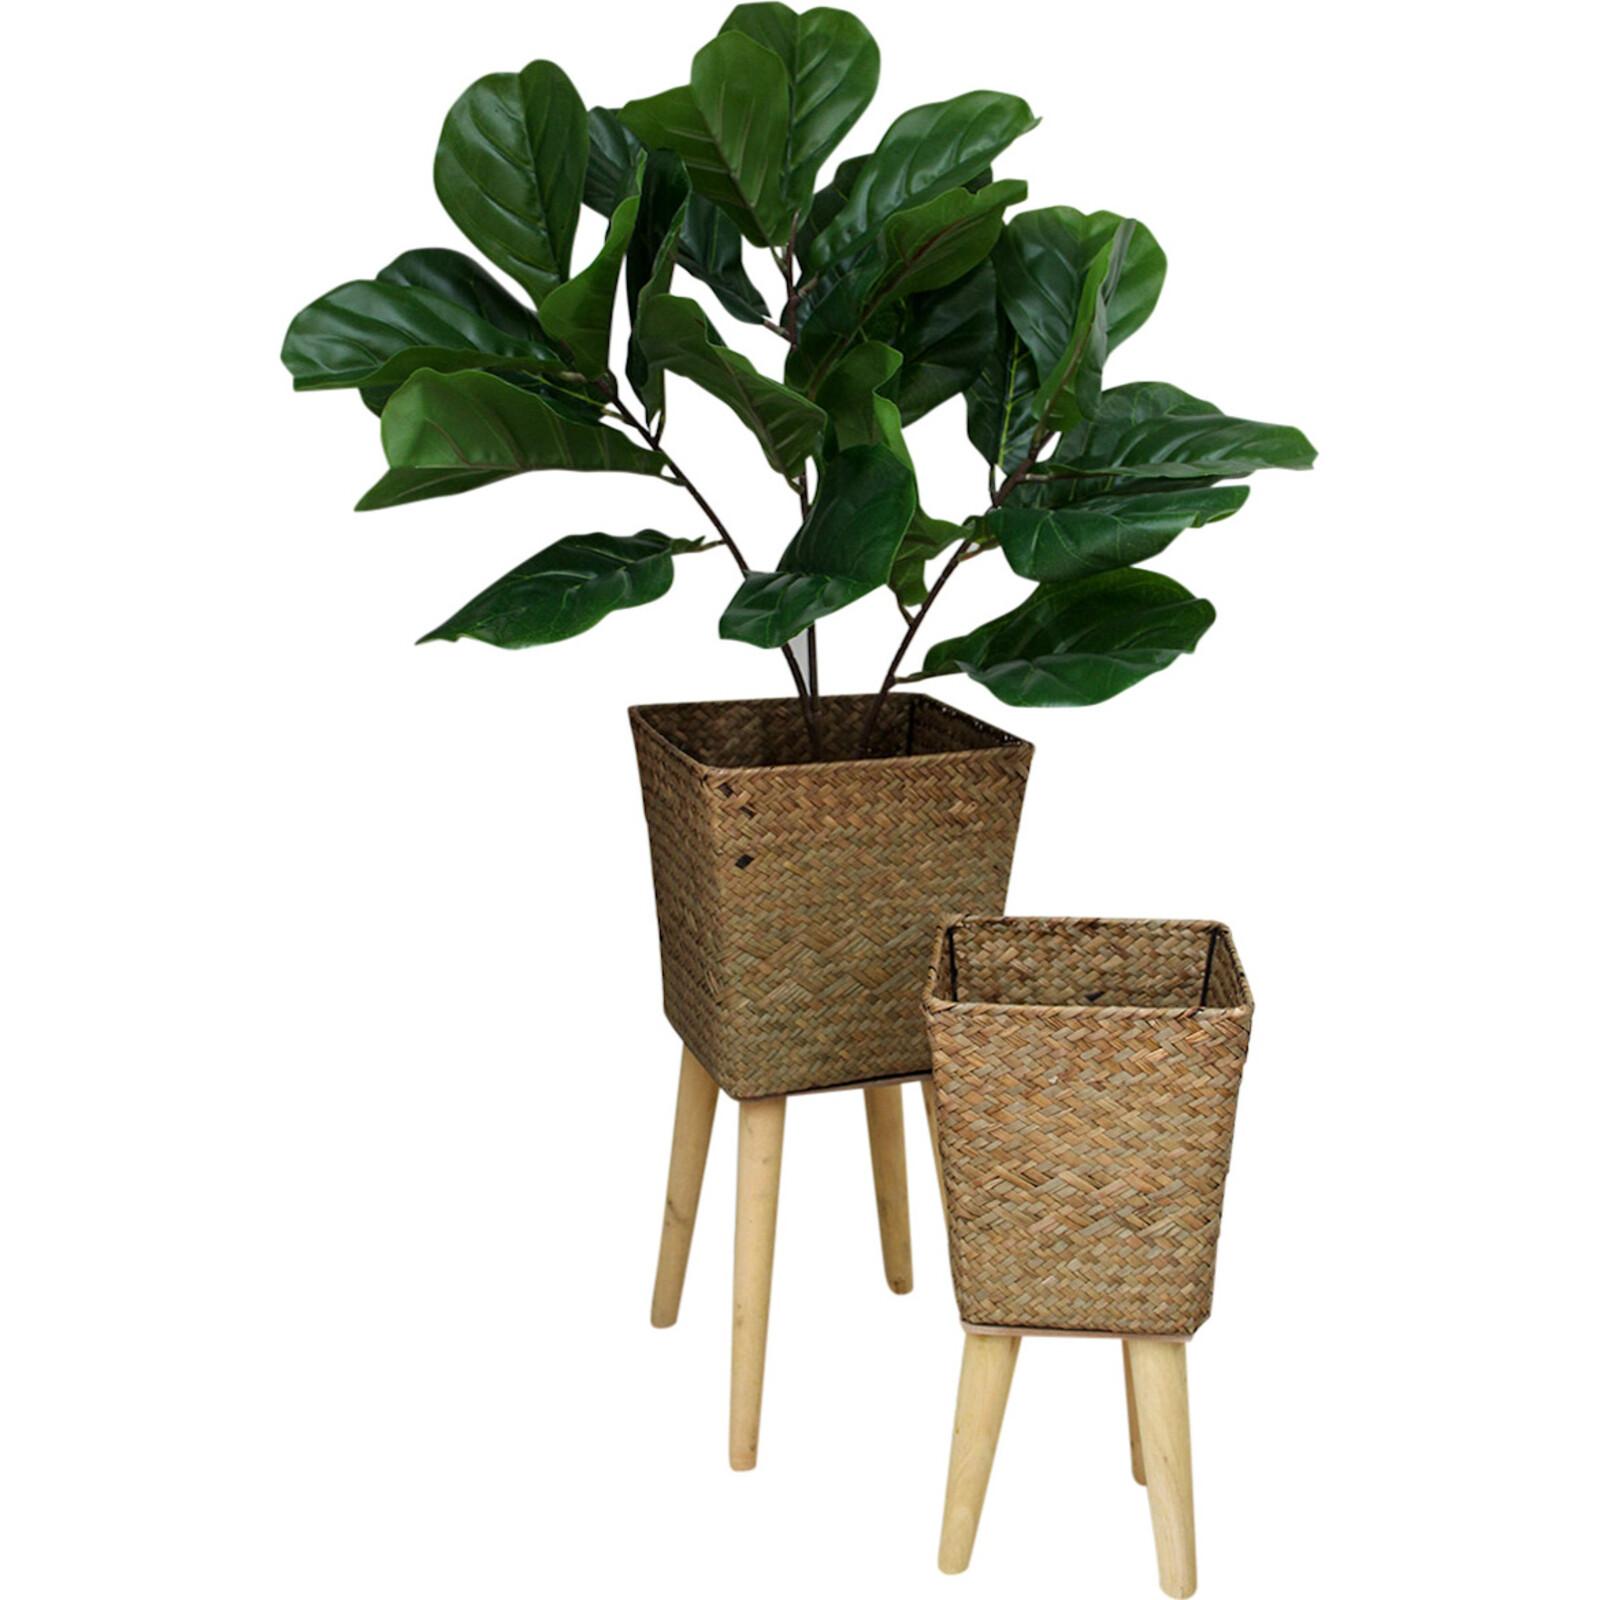 Planter S/2 Natural